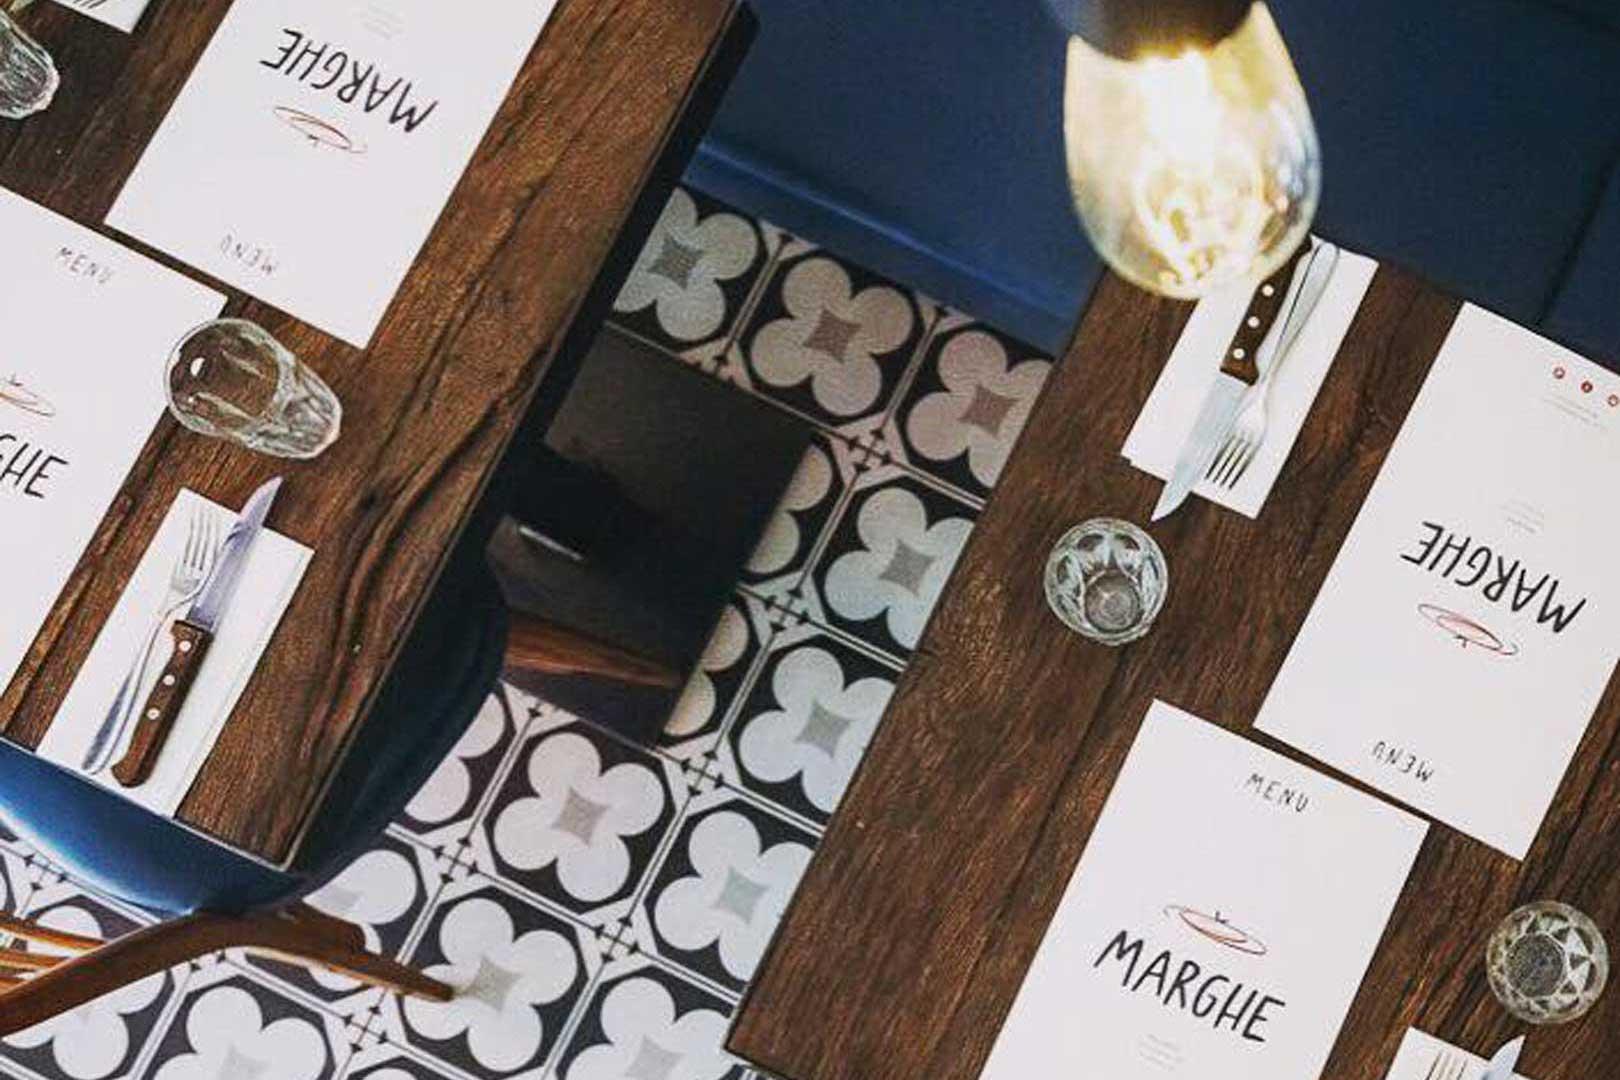 Marghe | Tavoli